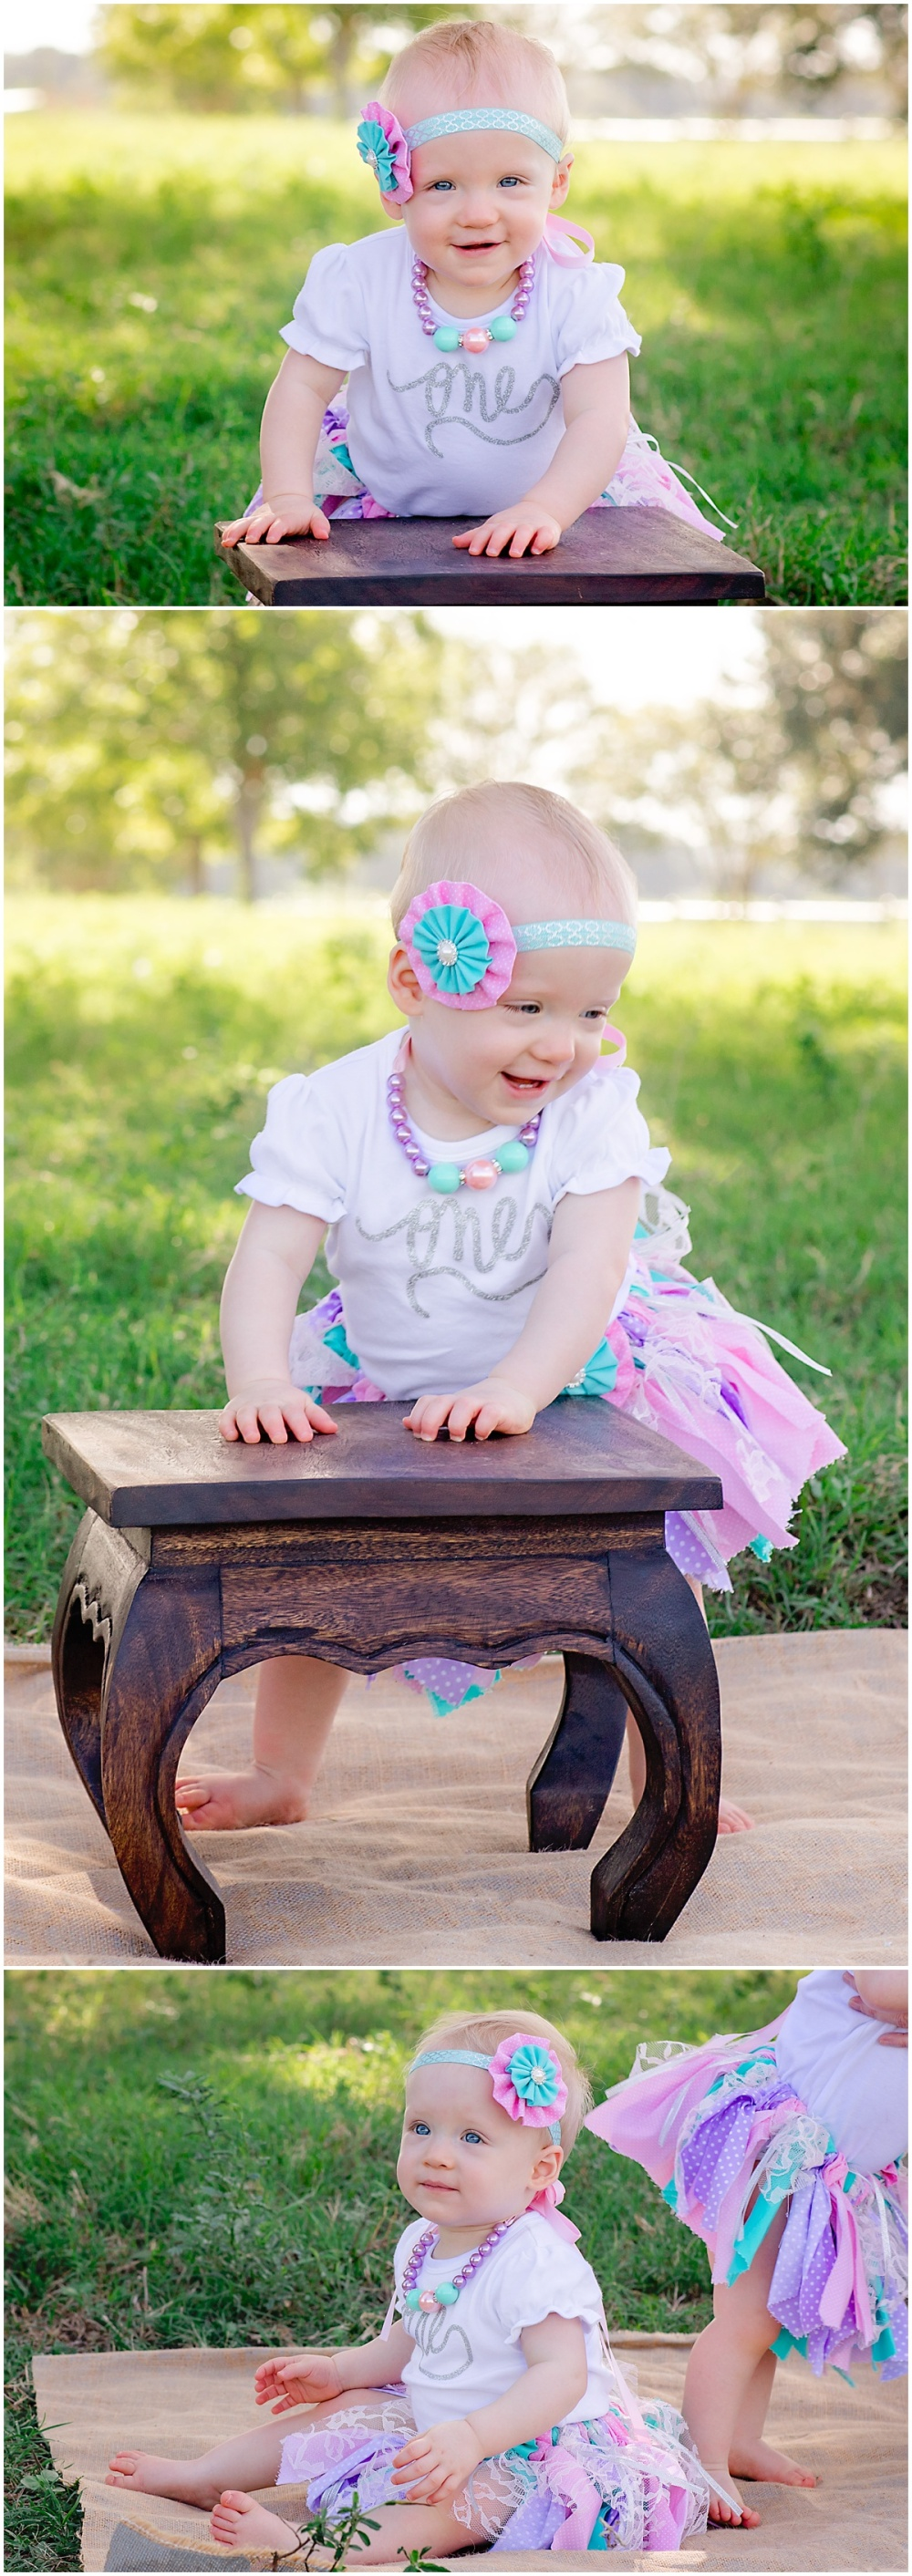 Family-Children-Portraits-Cake-Smash-Photos-San-Antonio-Hill-Country-Texas-Carly-Barton-Photography_0006.jpg